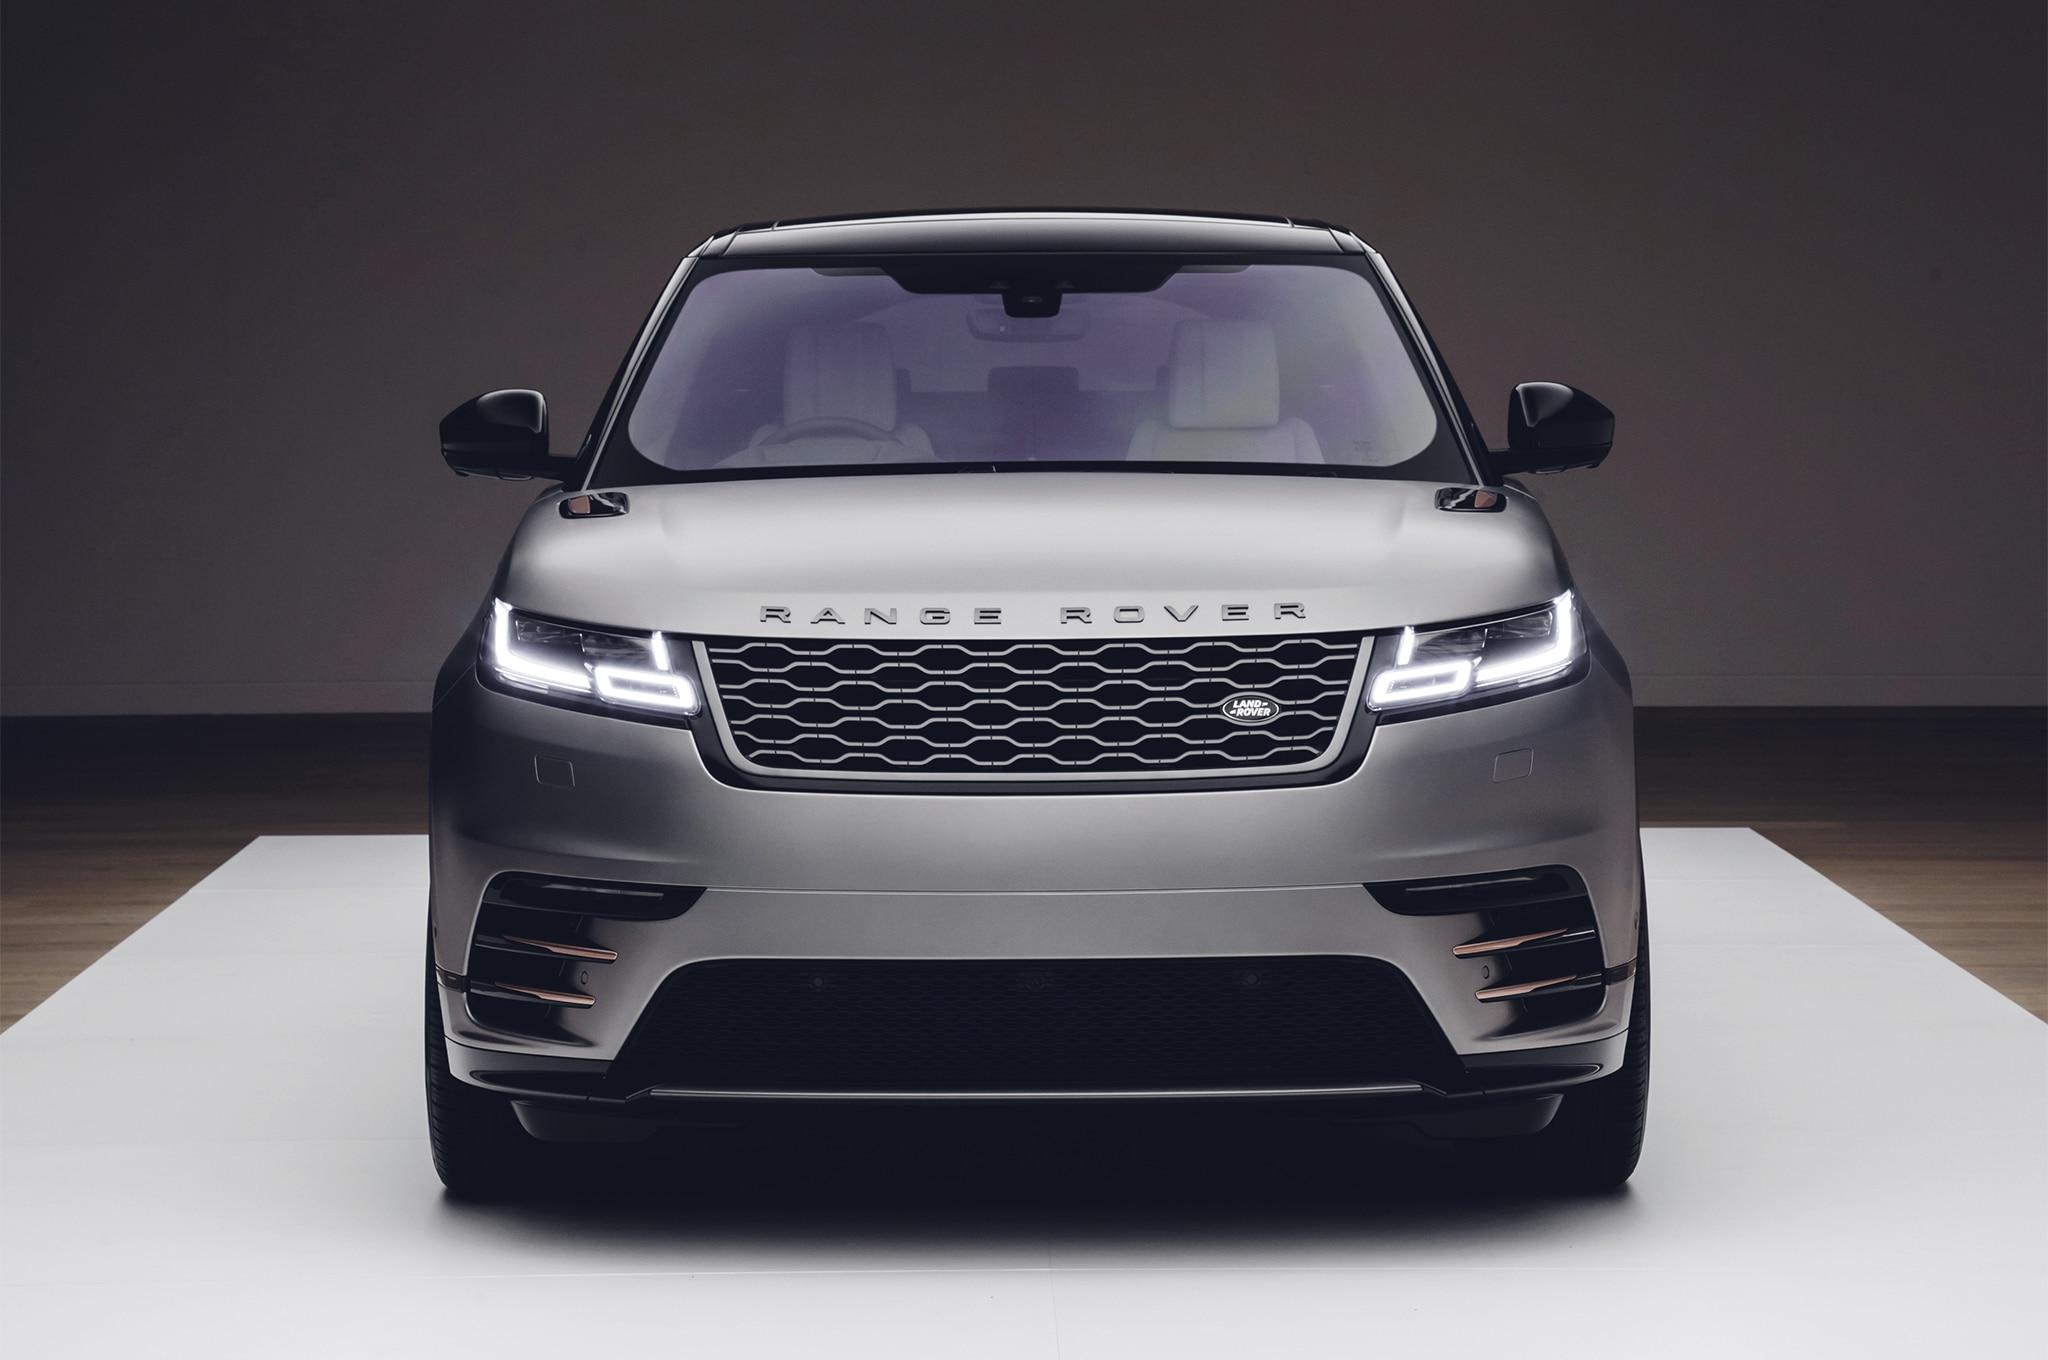 2018-Land-Rover-Range-Rover-Velar-front-end-1-9